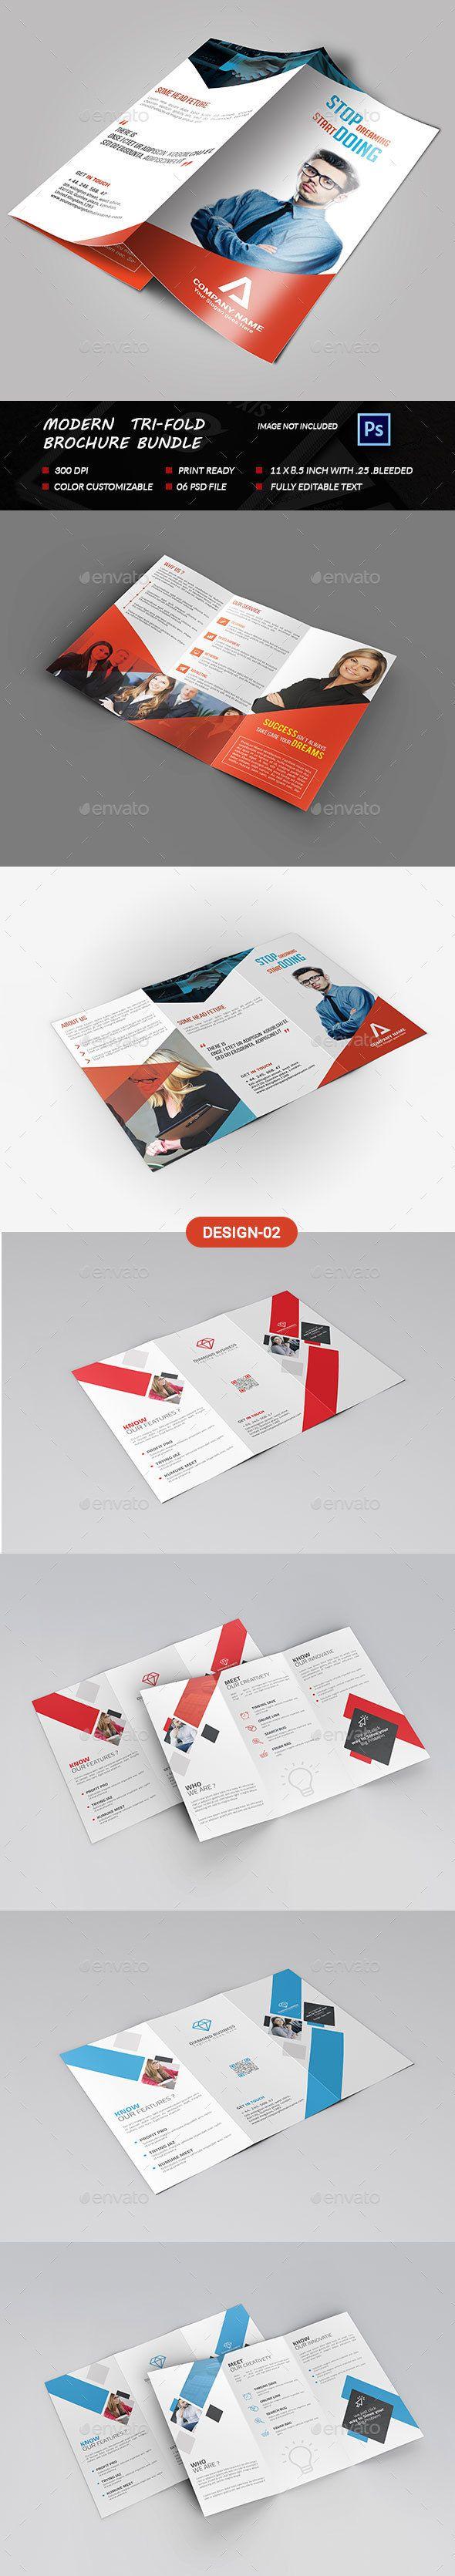 Modern Tri-fold Brochure Template PSD Bundle. Download here: http://graphicriver.net/item/modern-trifold-brochure-bundle-/15475994?ref=ksioks